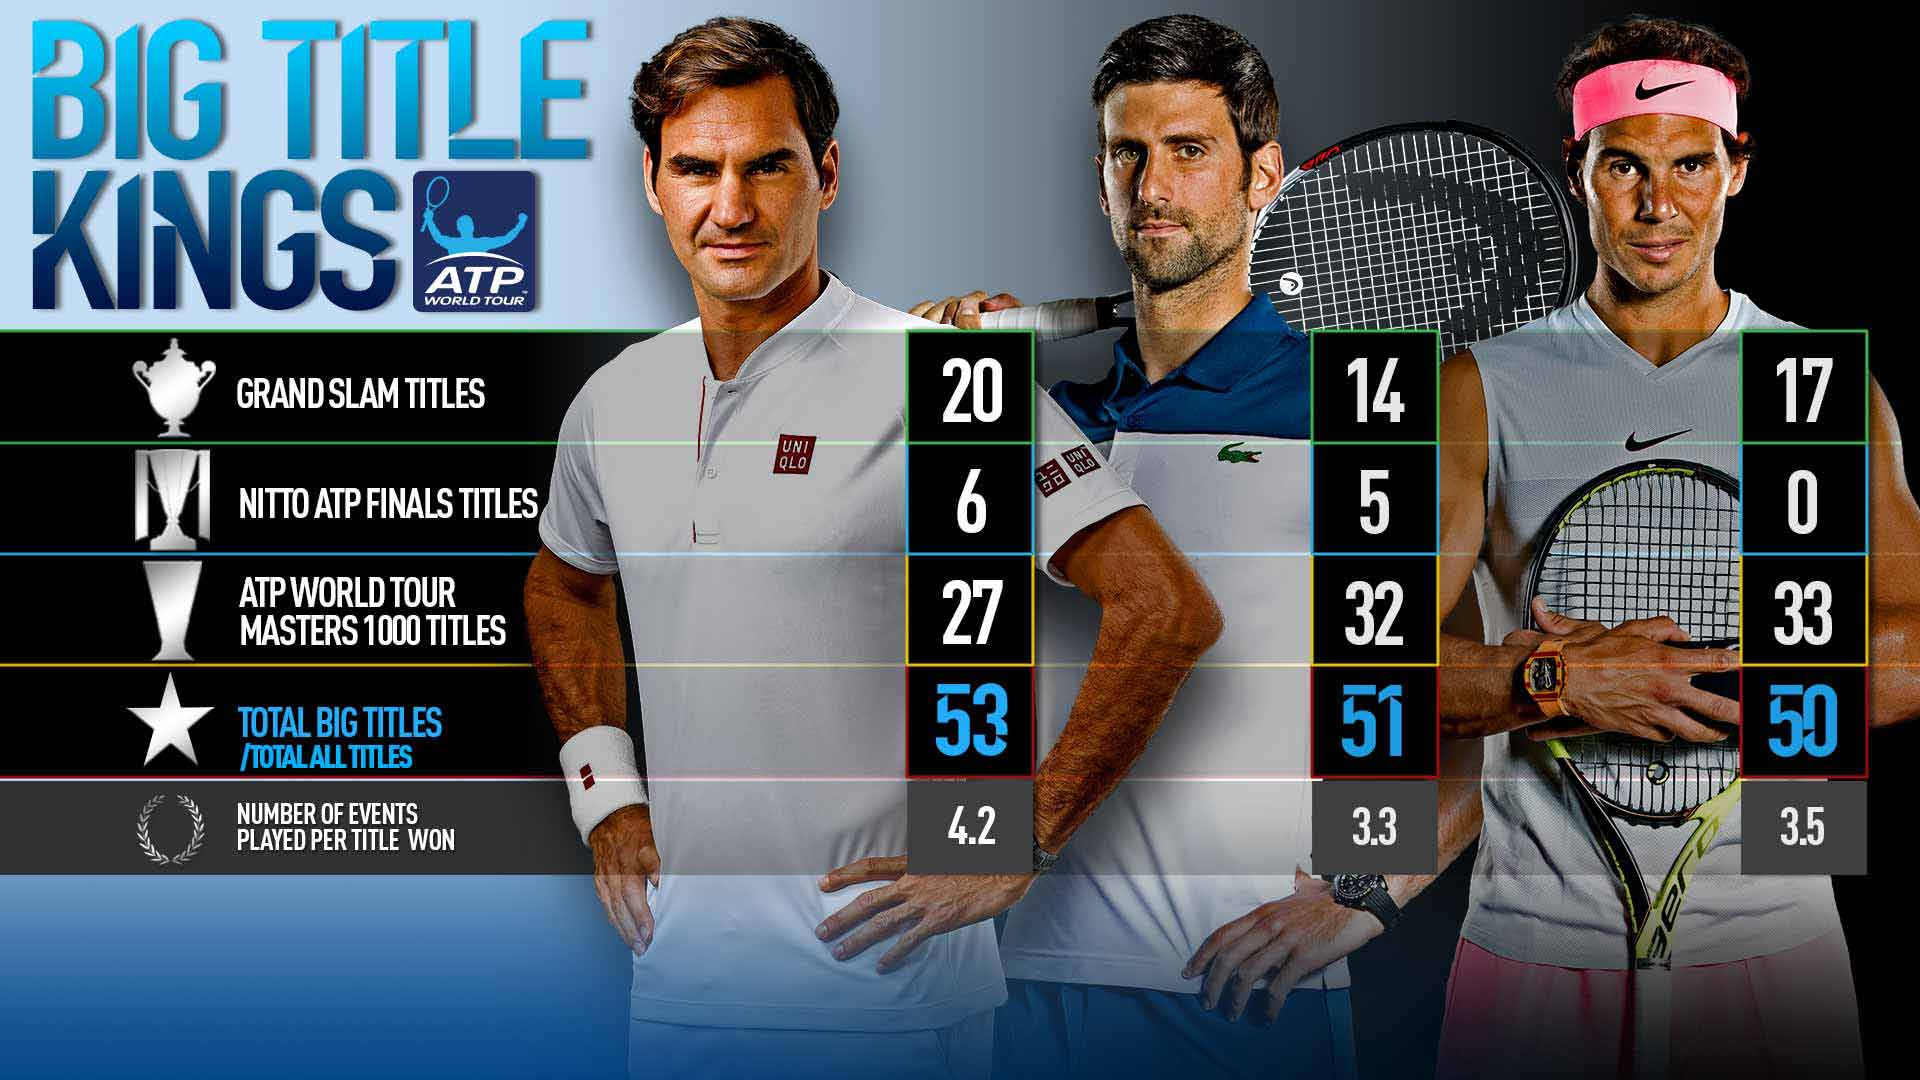 Novak Djokovic Passes Rafael Nadal On Big Titles Leaderboard Atp Tour Tennis